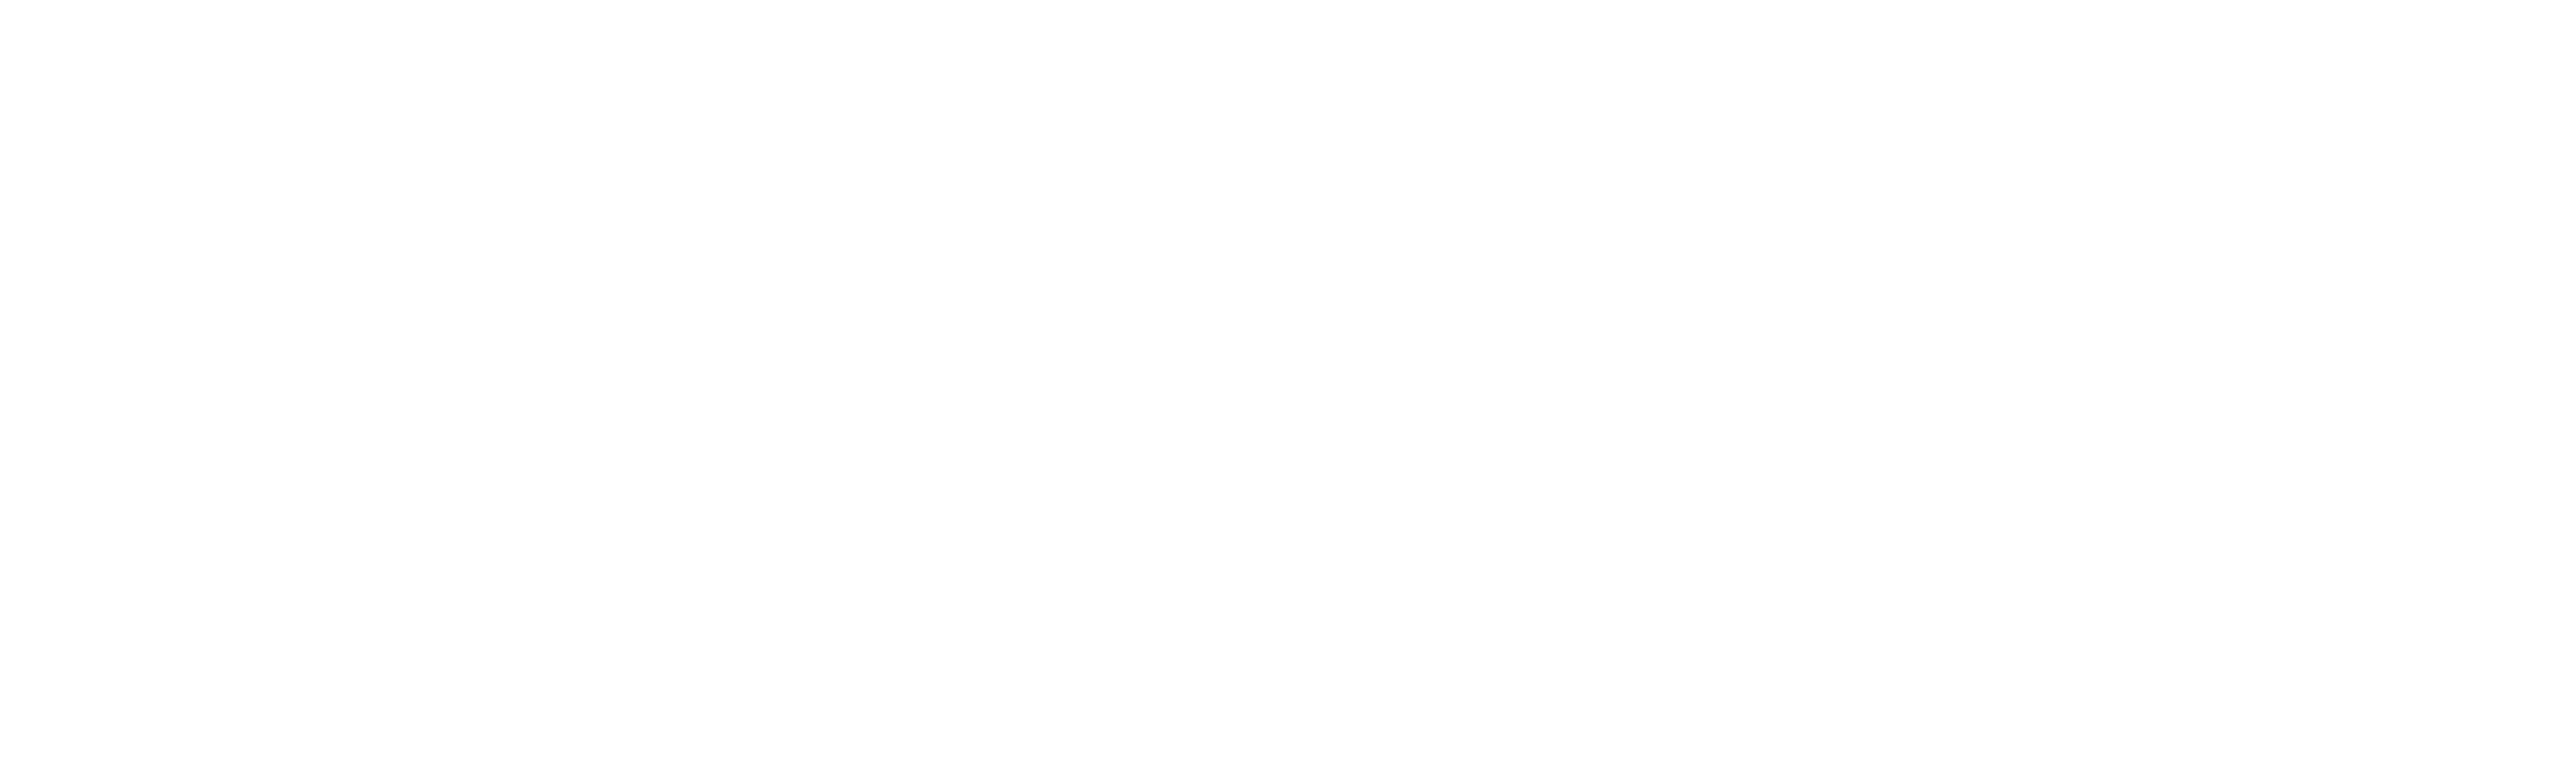 faktorteh logo